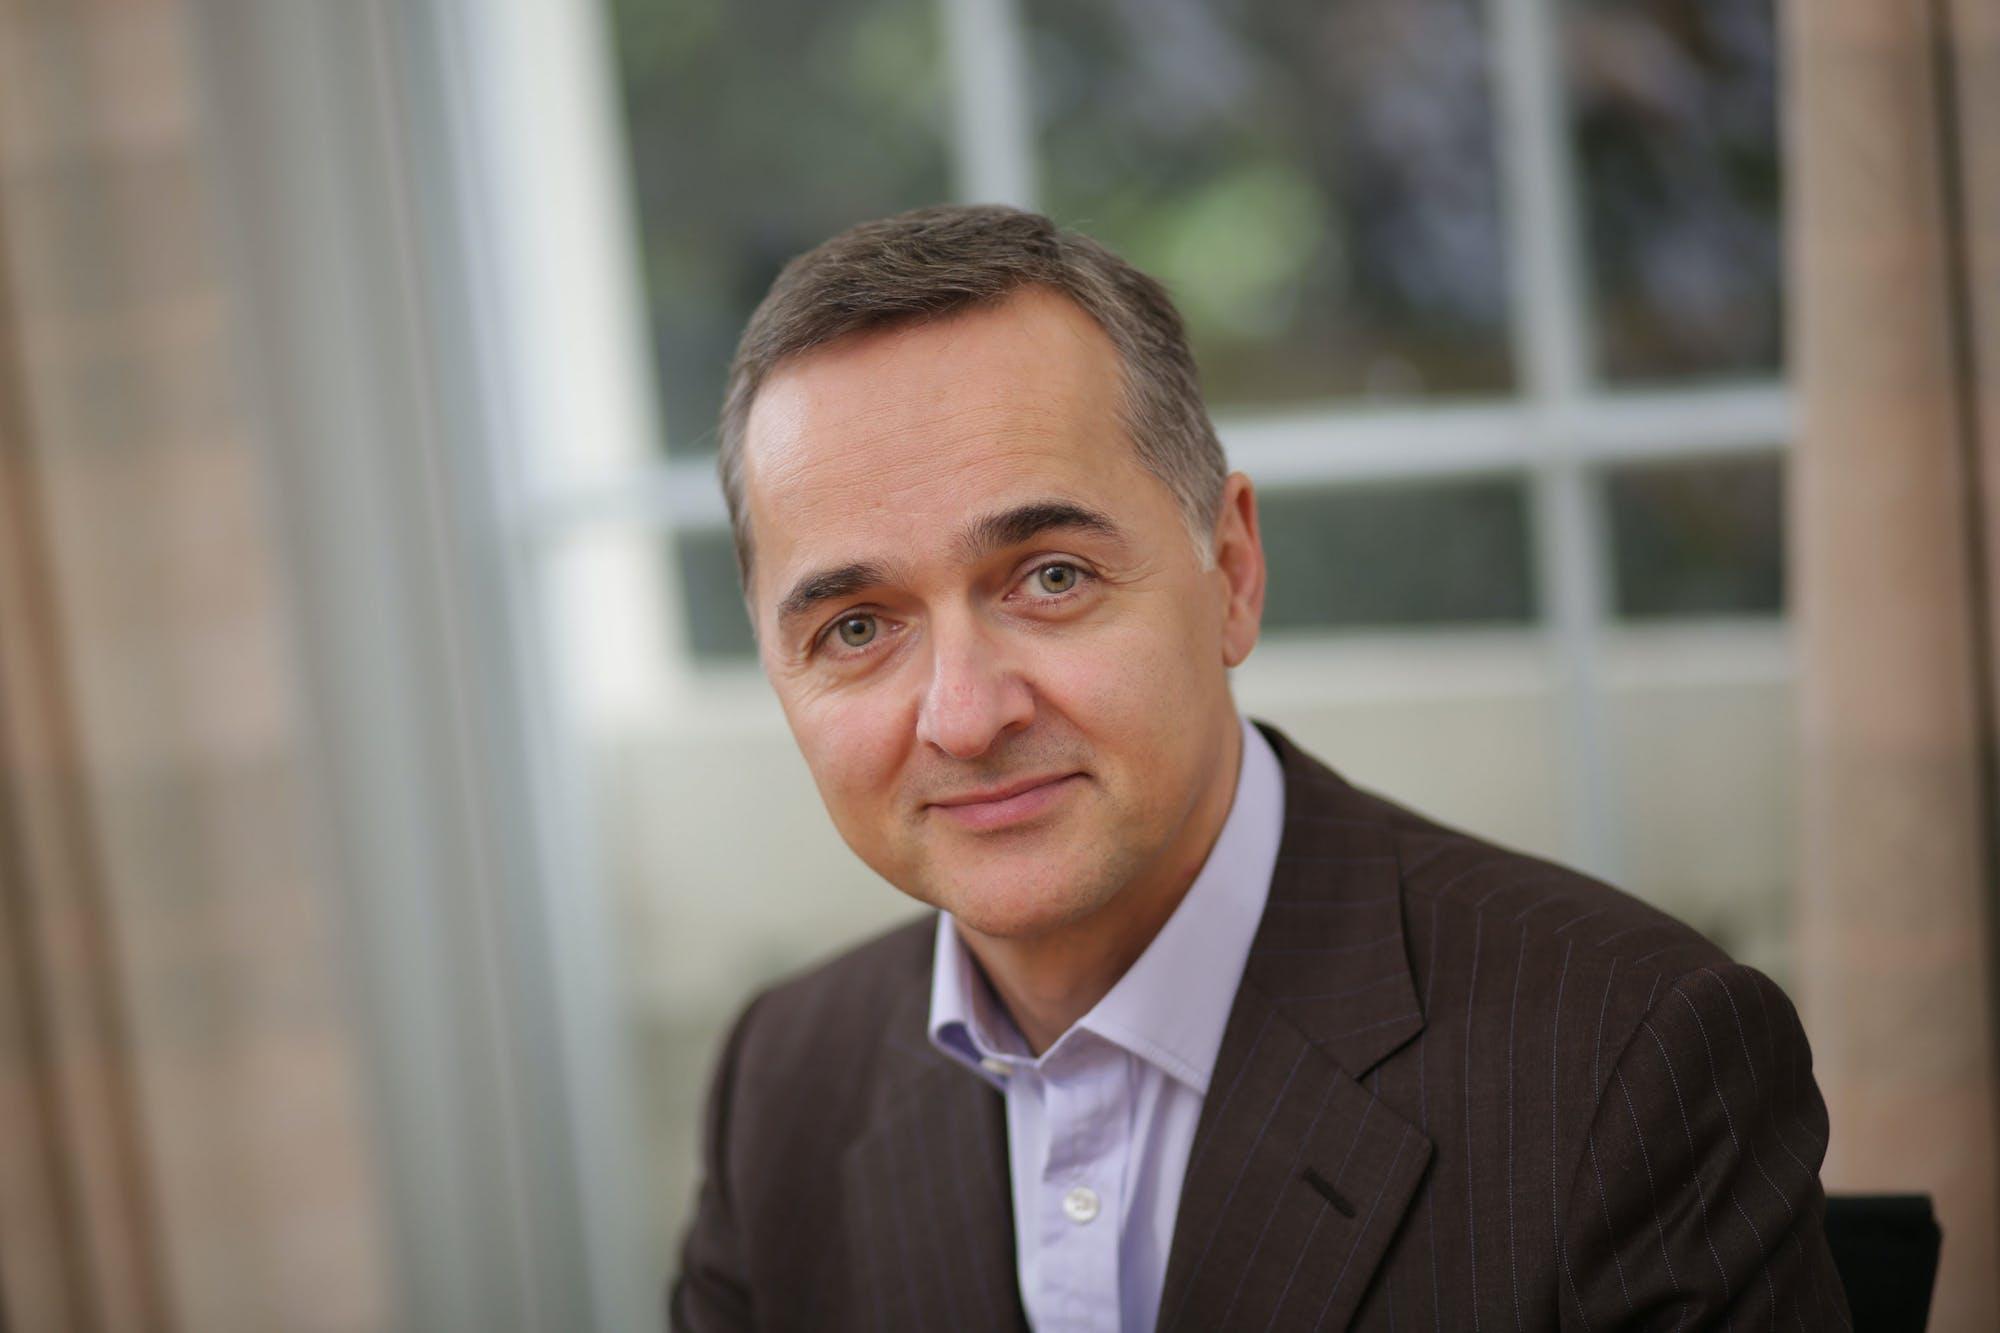 Walpole Summit The Future of British Luxury by Nader Tavassoli, Professor of Marketing, London Business School